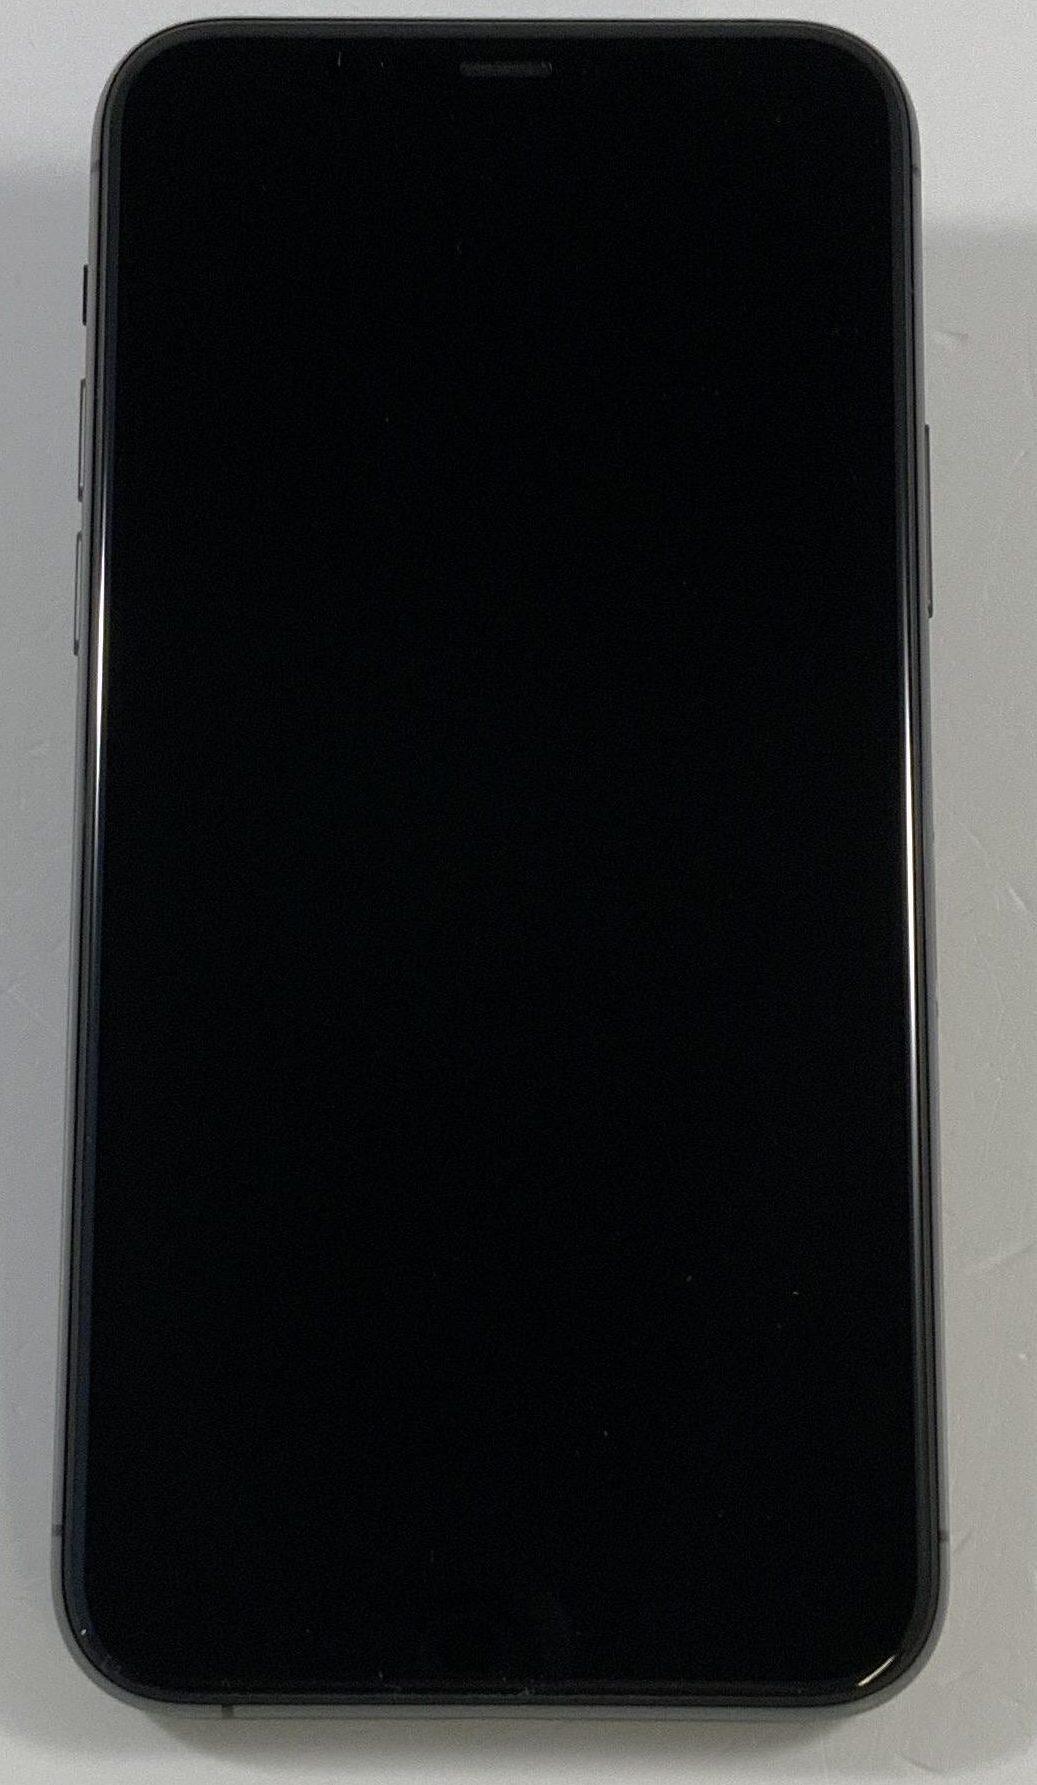 iPhone 11 Pro 256GB, 256GB, Space Gray, Afbeelding 1